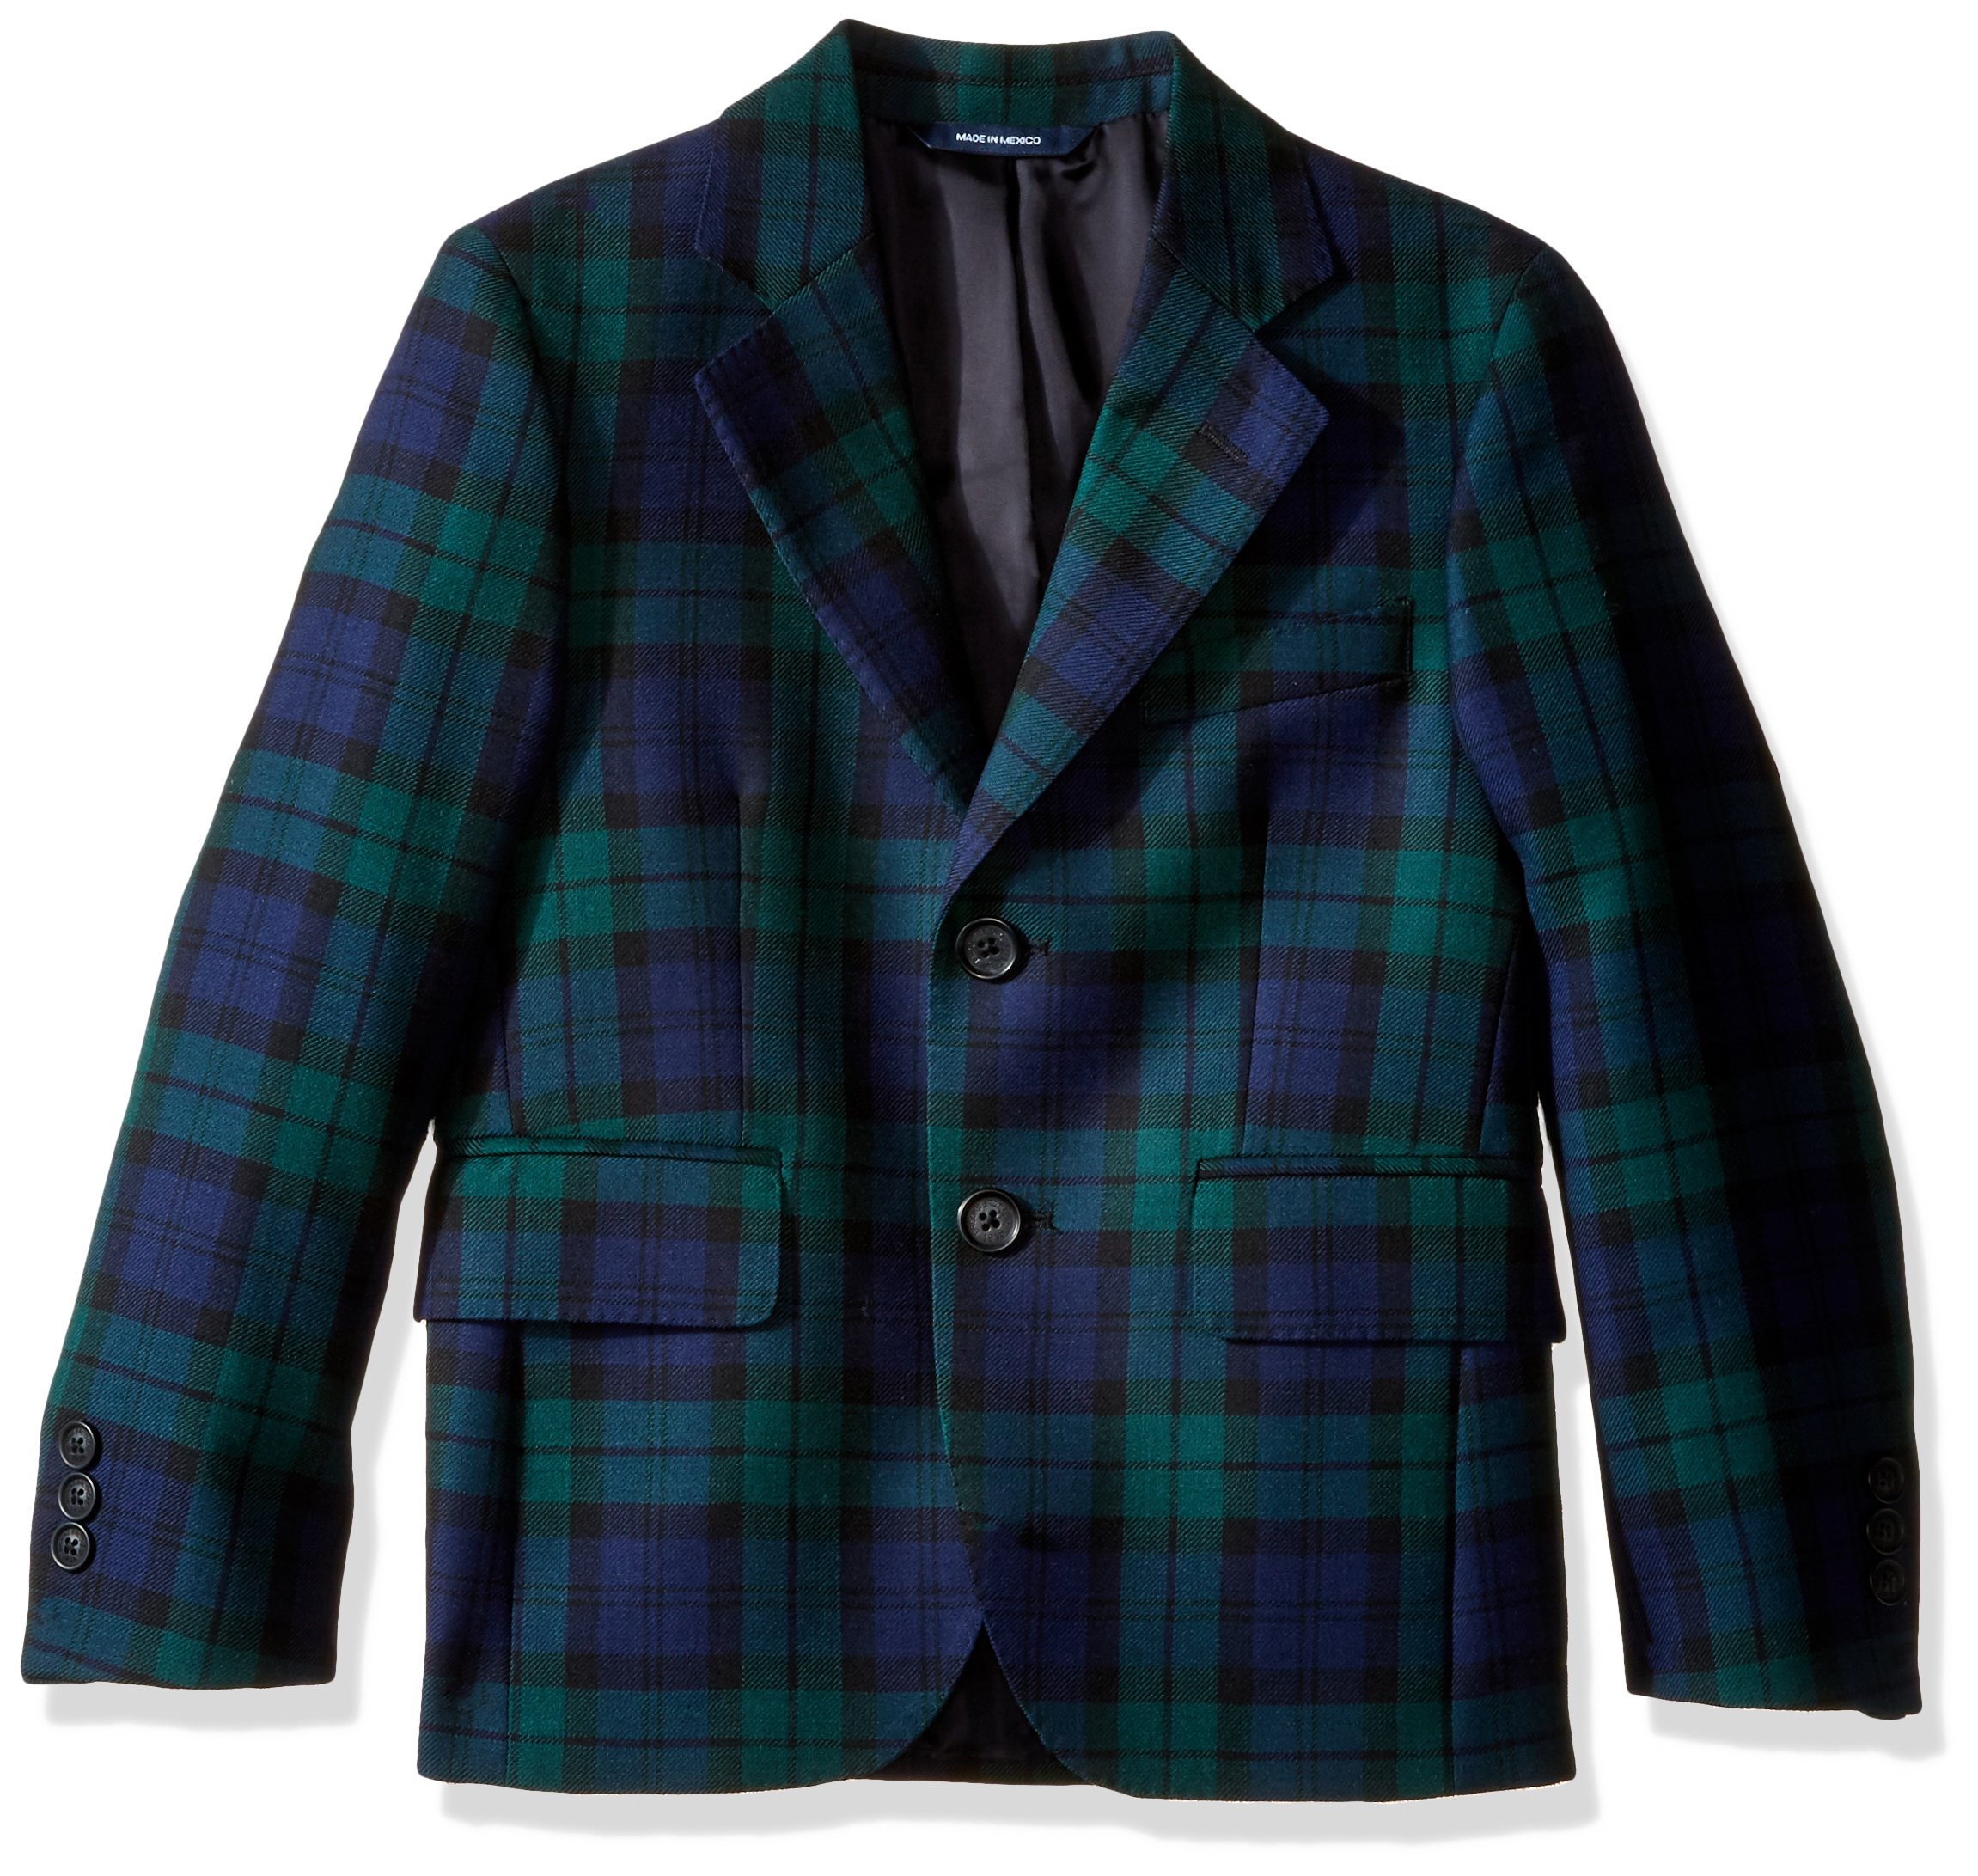 Brooks Brothers Big Boys' Blackwatch Suit Jacket, Blkwatch, 10